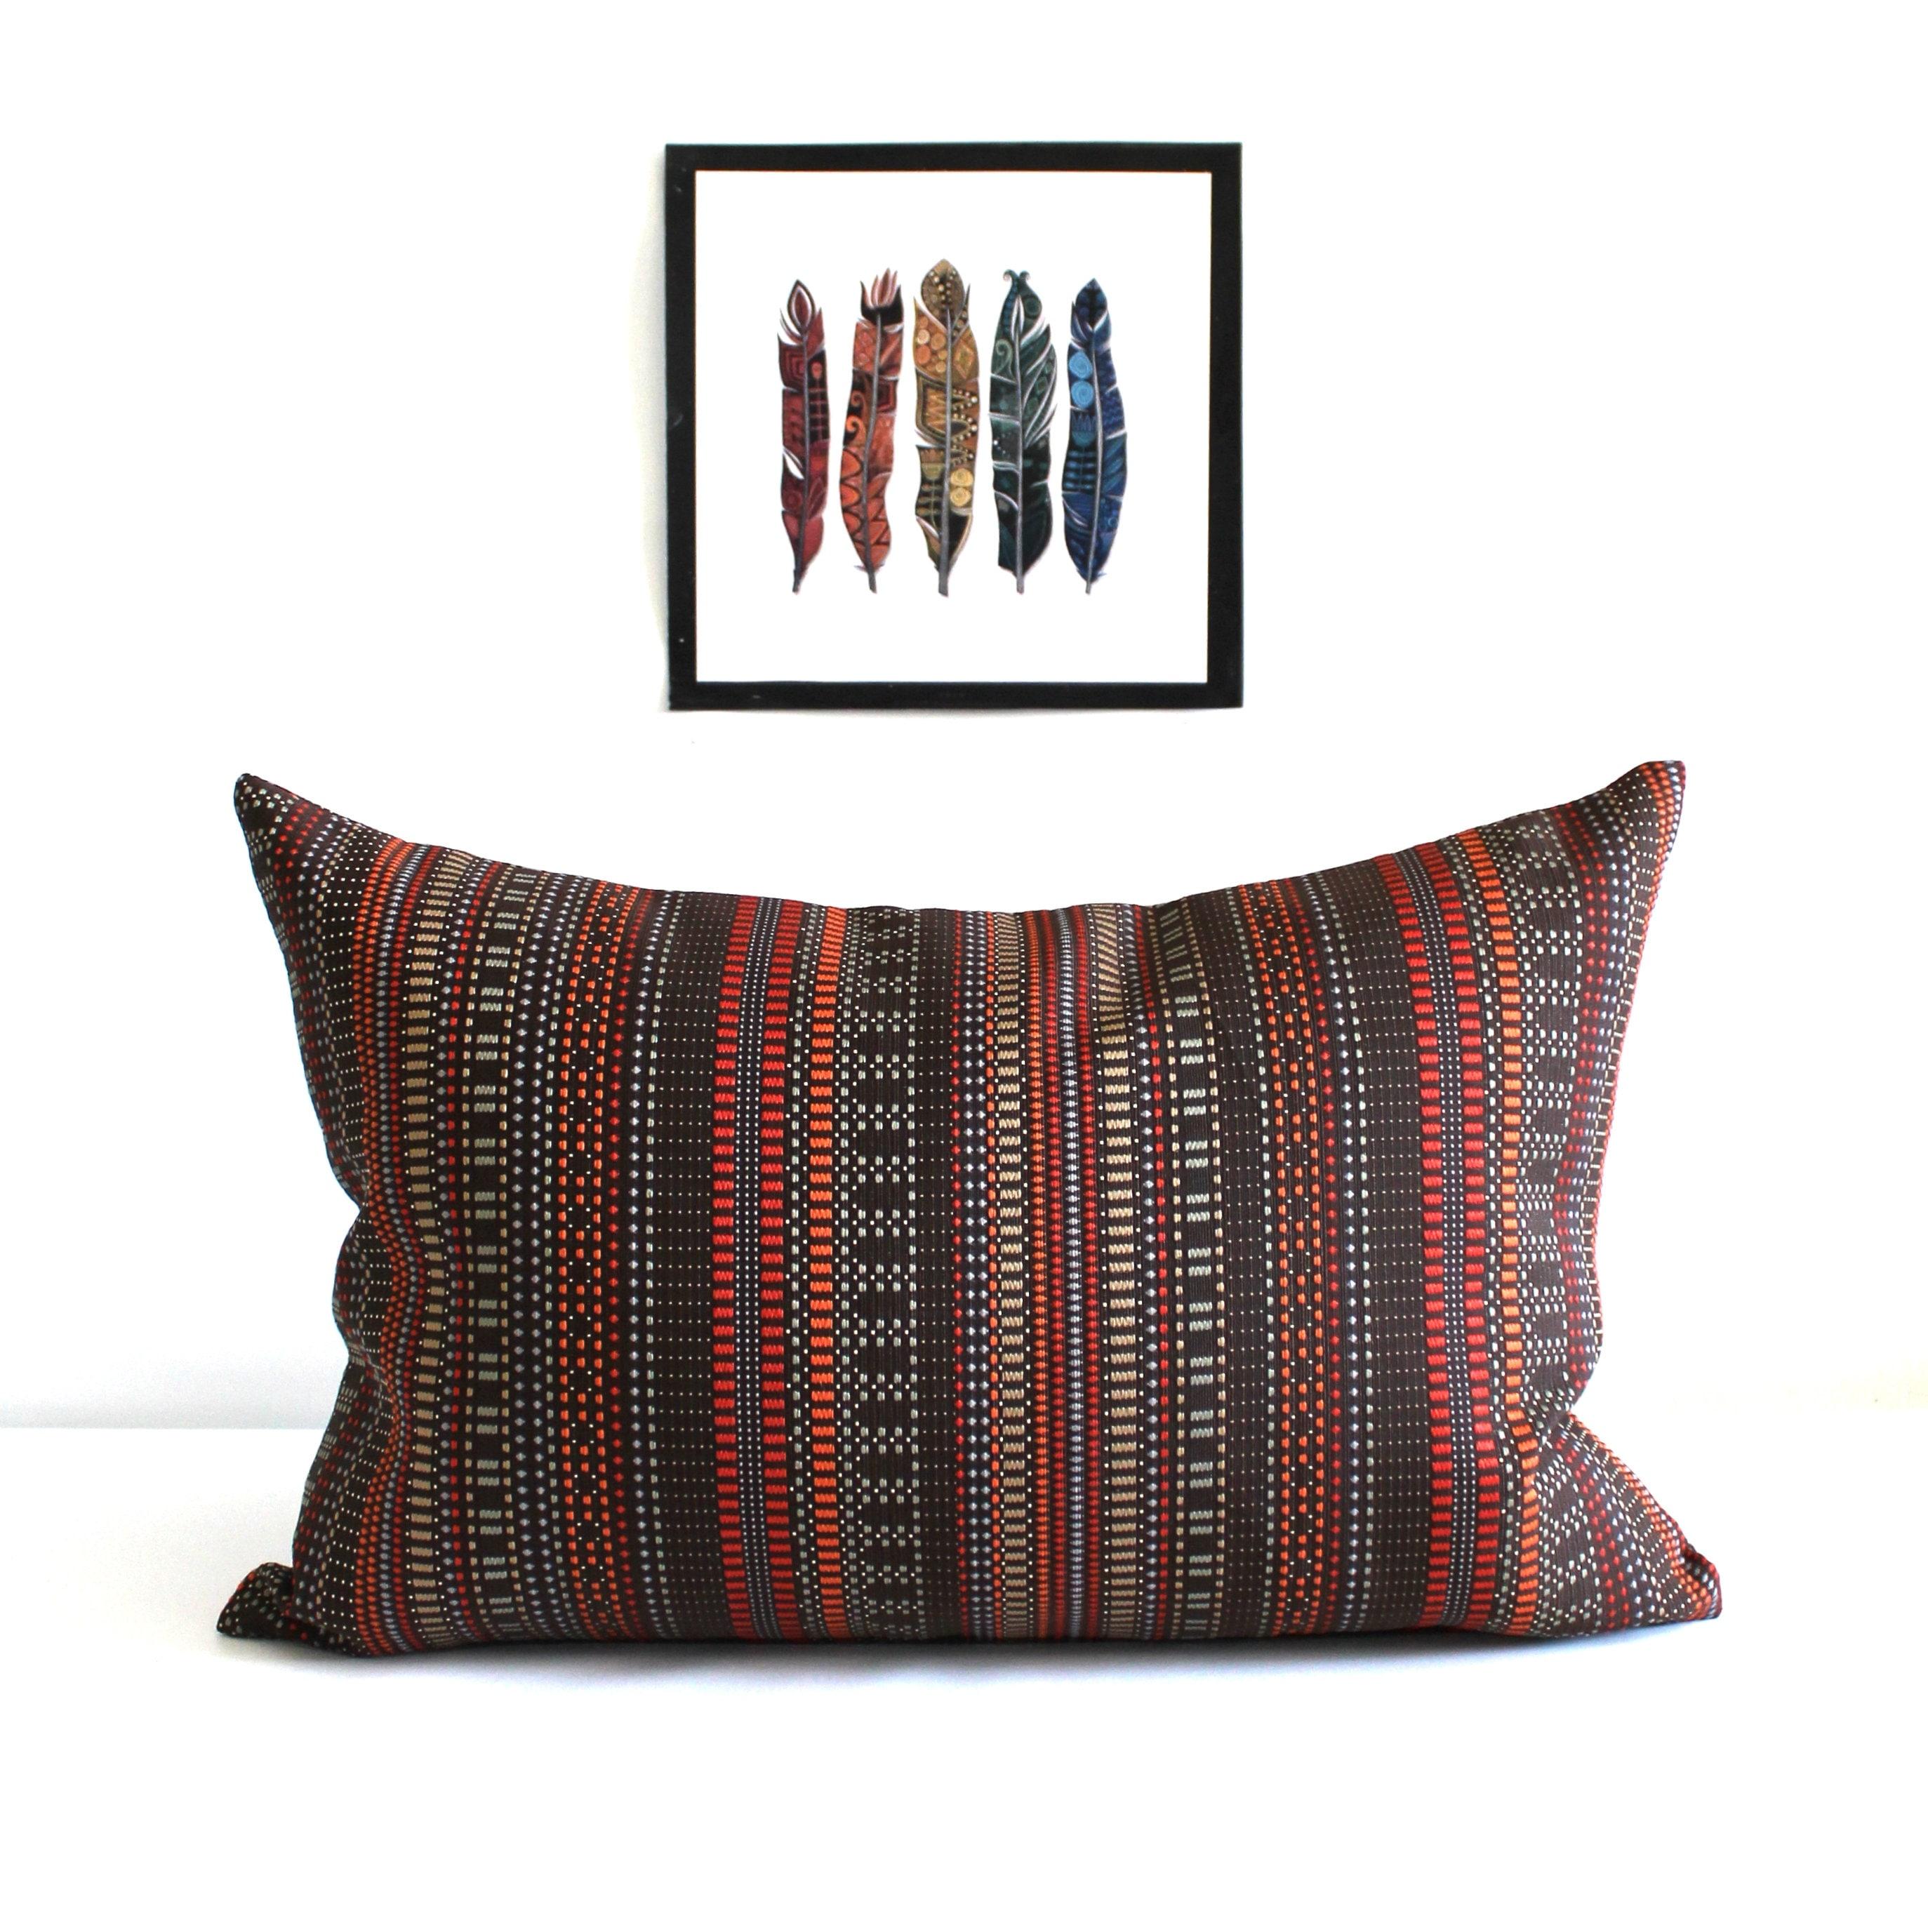 Lumbar Pillow Cover Rust Brown Throw Pillow Covers Stripe Upholstery Fabric Oblong Decorative Pillow 14x26 12x24 12x21 12x18 12x16 10x20